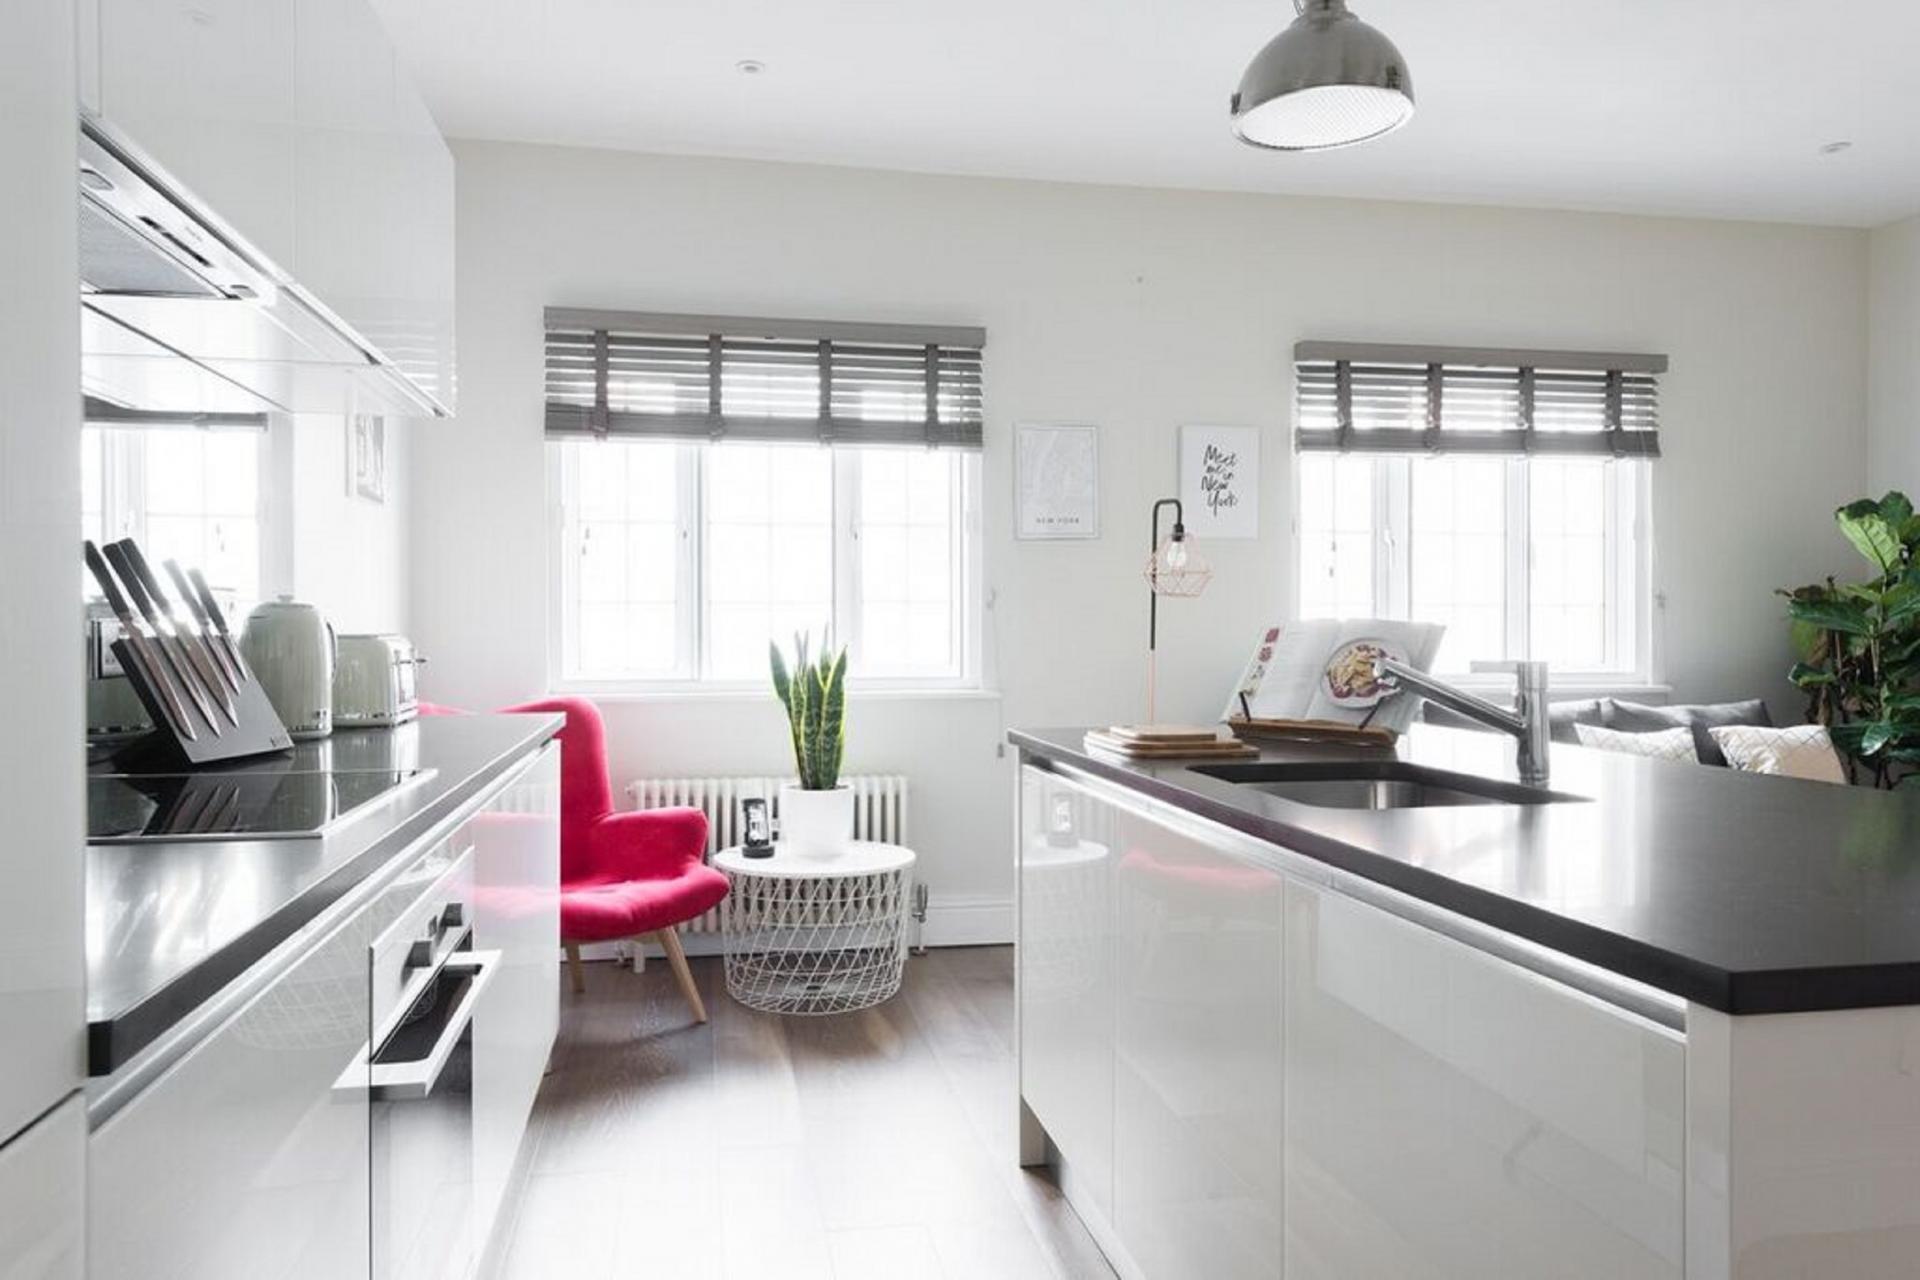 Kitchen at The Soho Studio Apartment, Paddington, London - Citybase Apartments